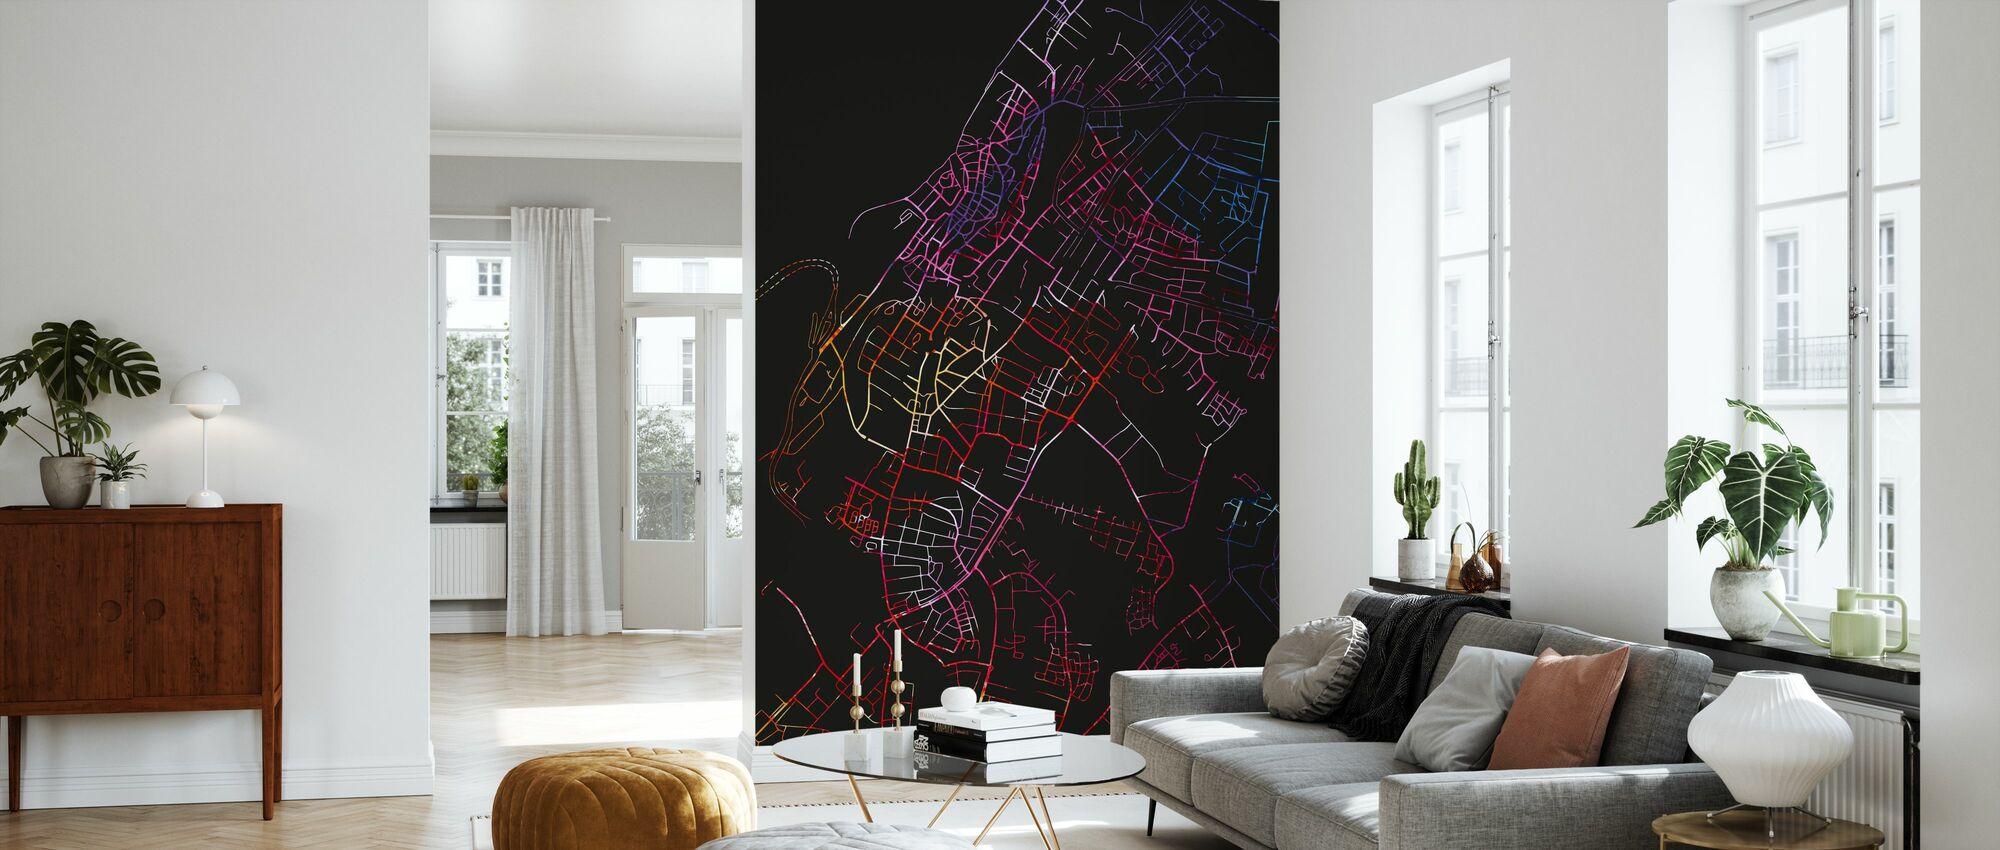 Visby in Sweden - Map – wall murals online – Photowall